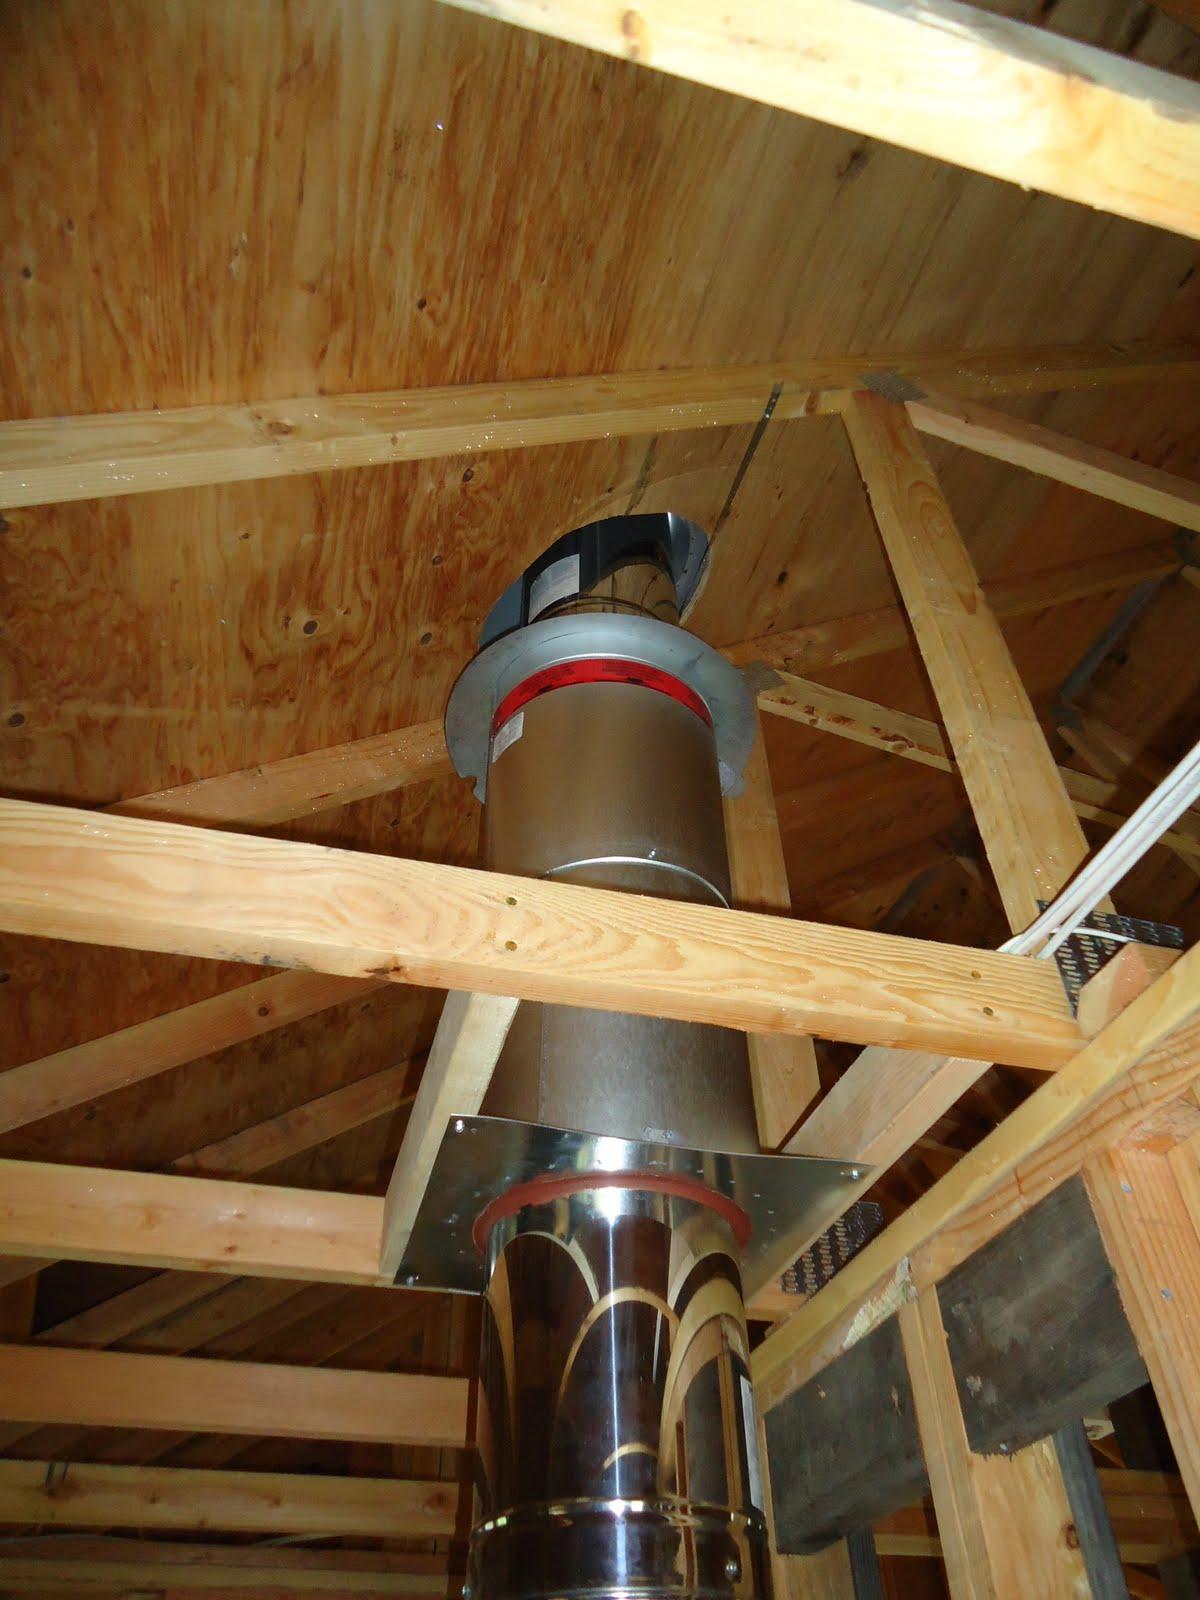 Installing Stove Pipe Through Roof - Acpfoto